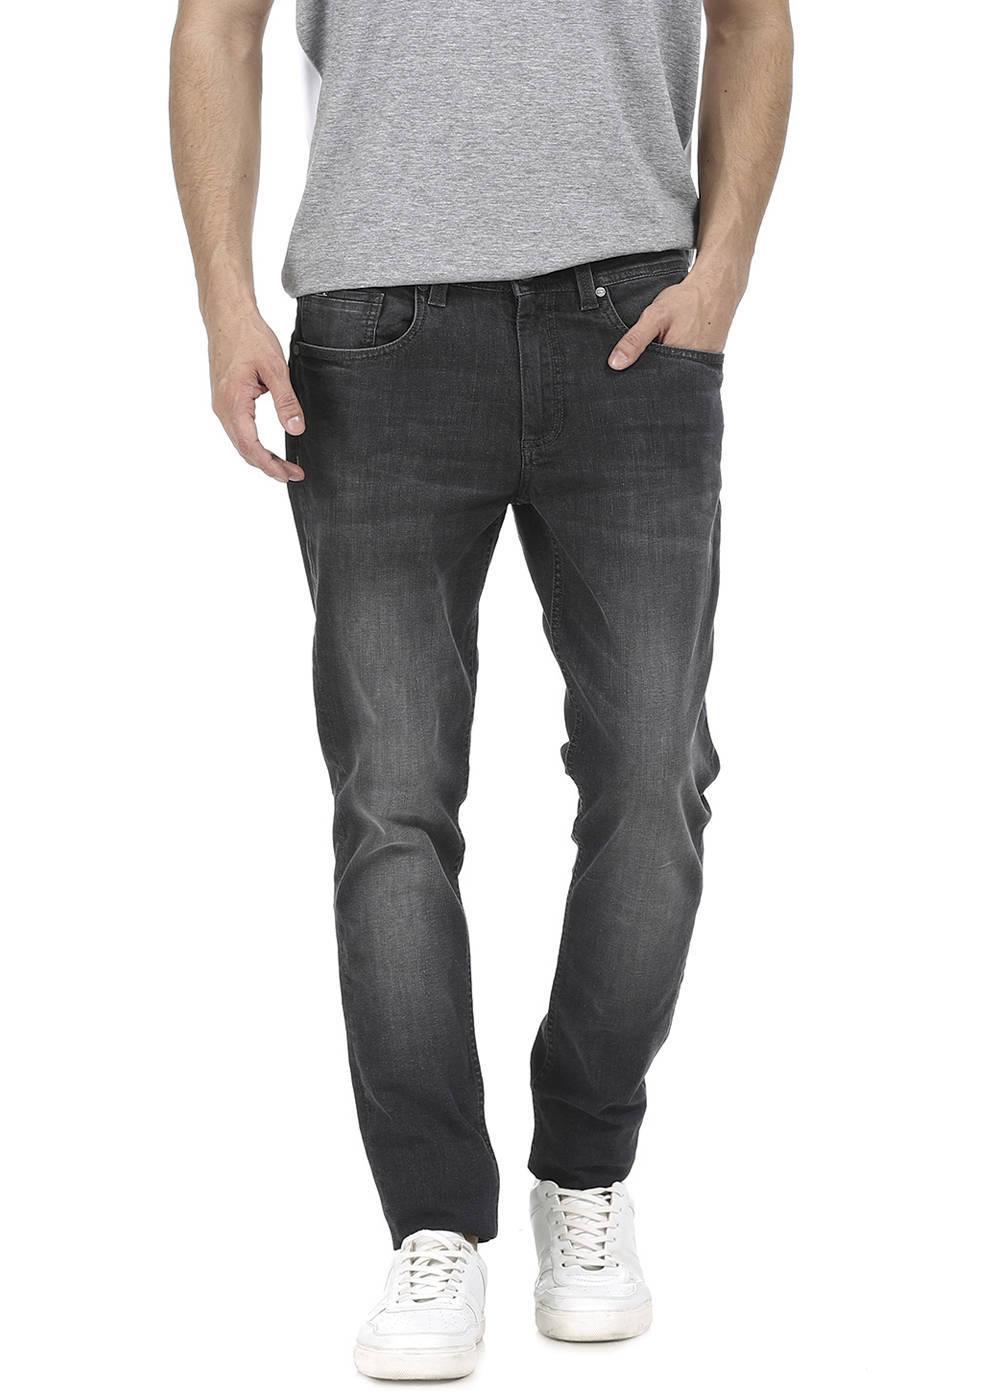 Basics | Basics Blade Fit Excalibur Grey Stretch Jean